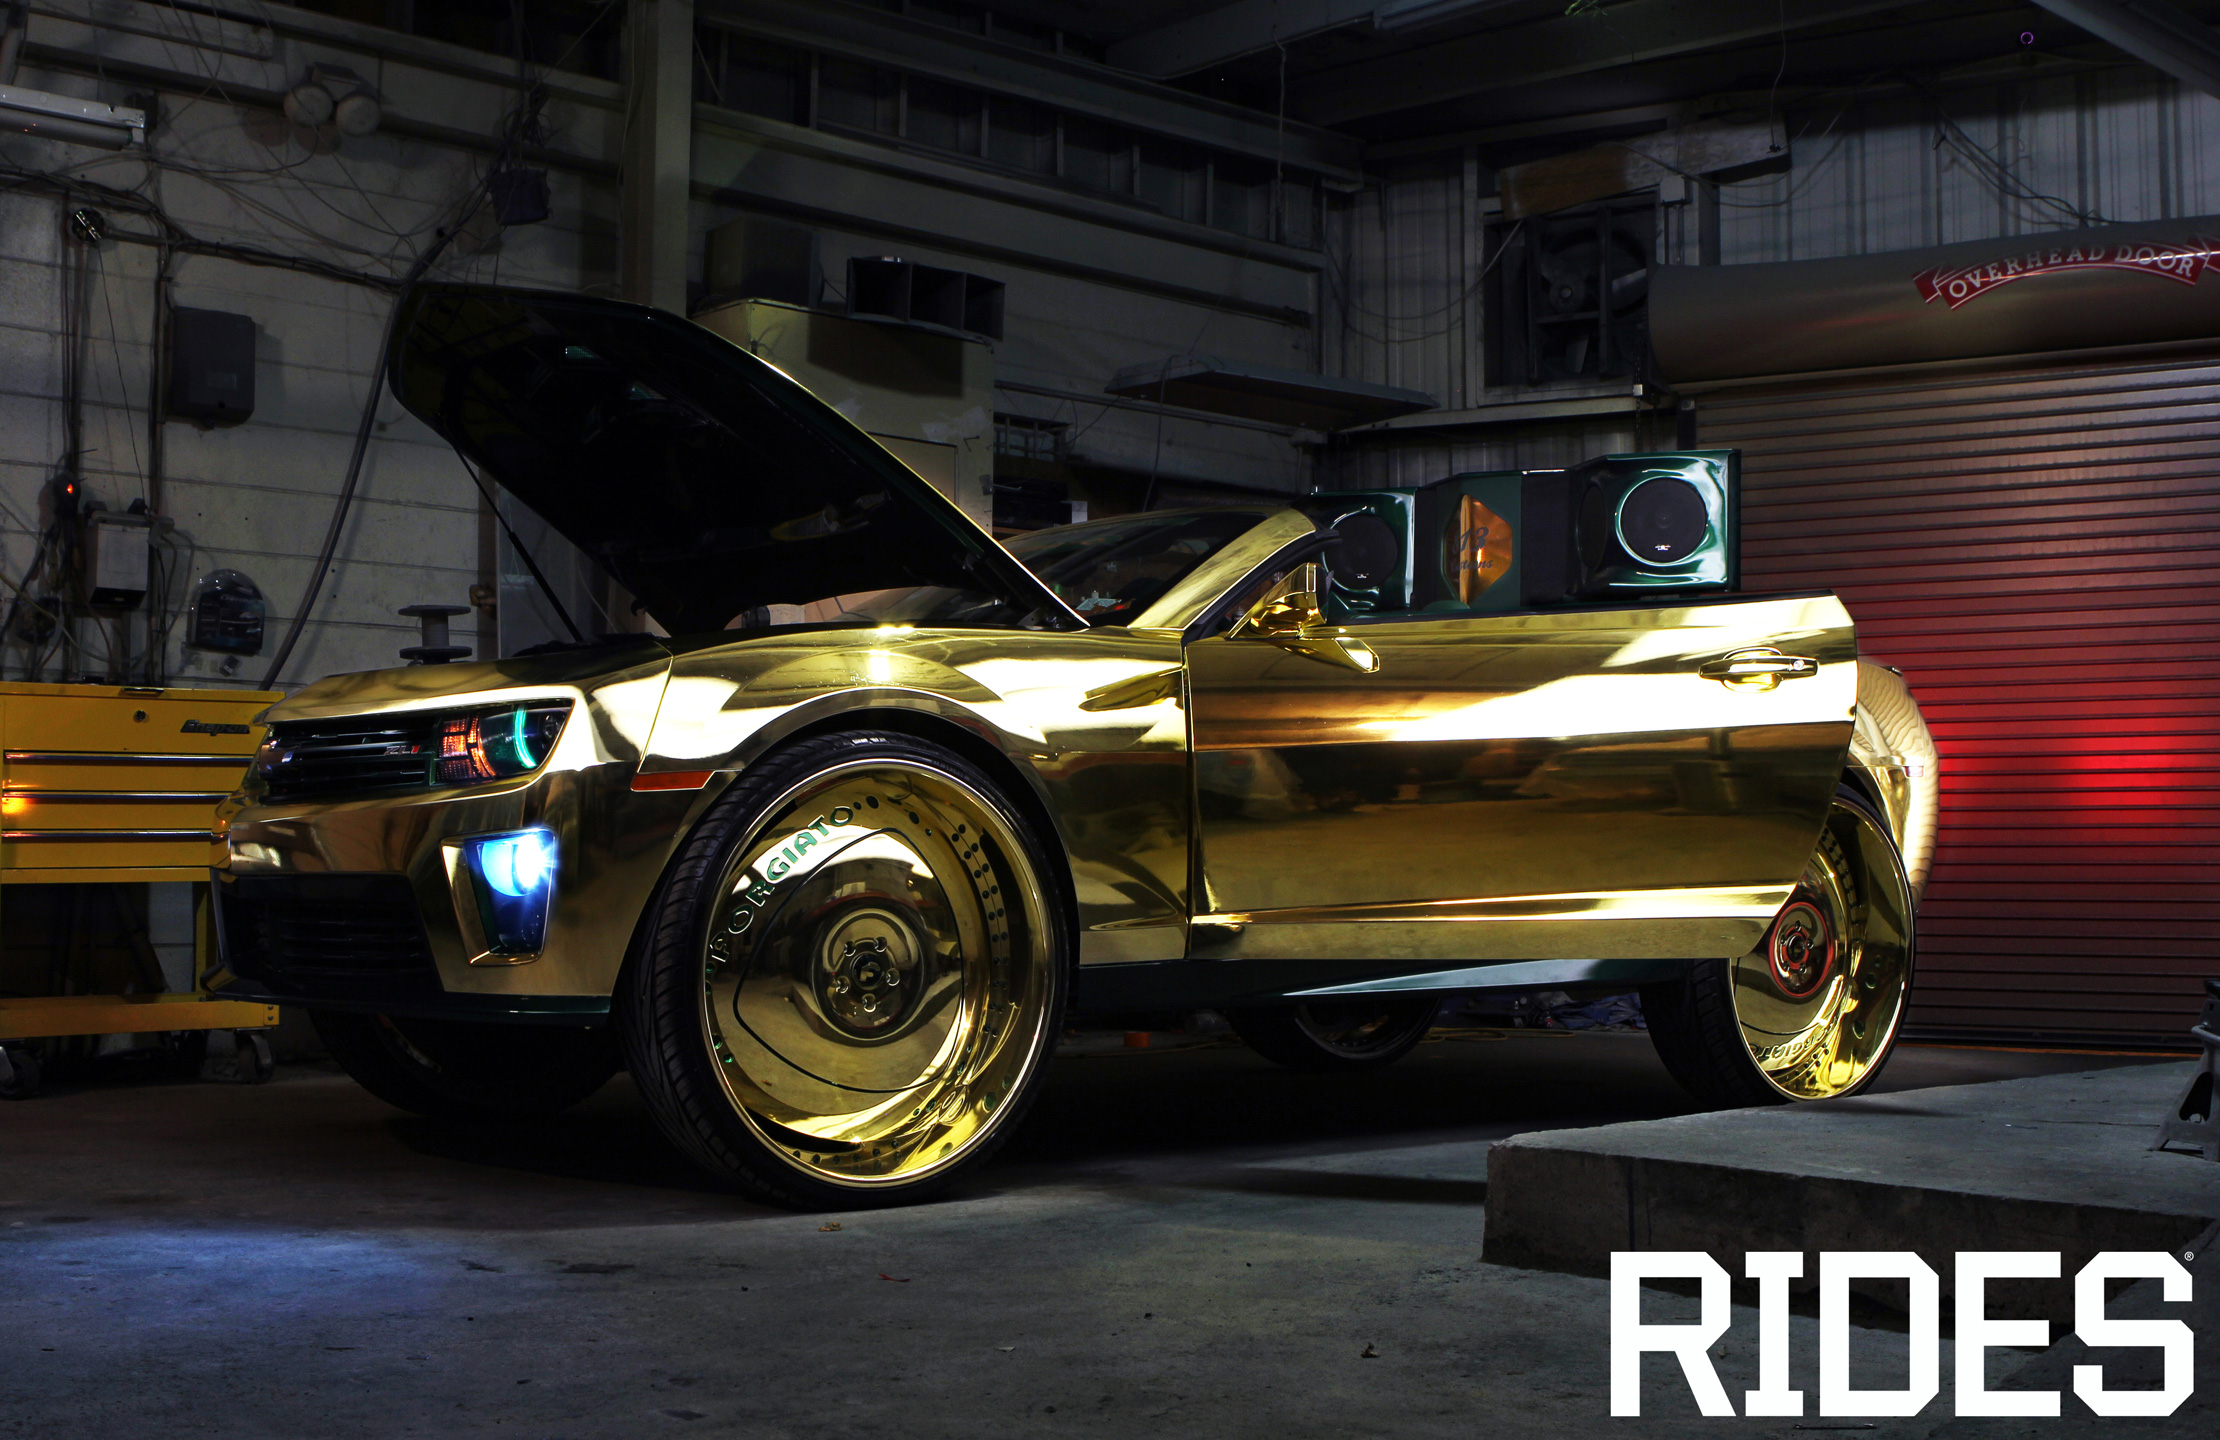 rides gold camaro zl1 king 813 customs linny j chevy chevrolet